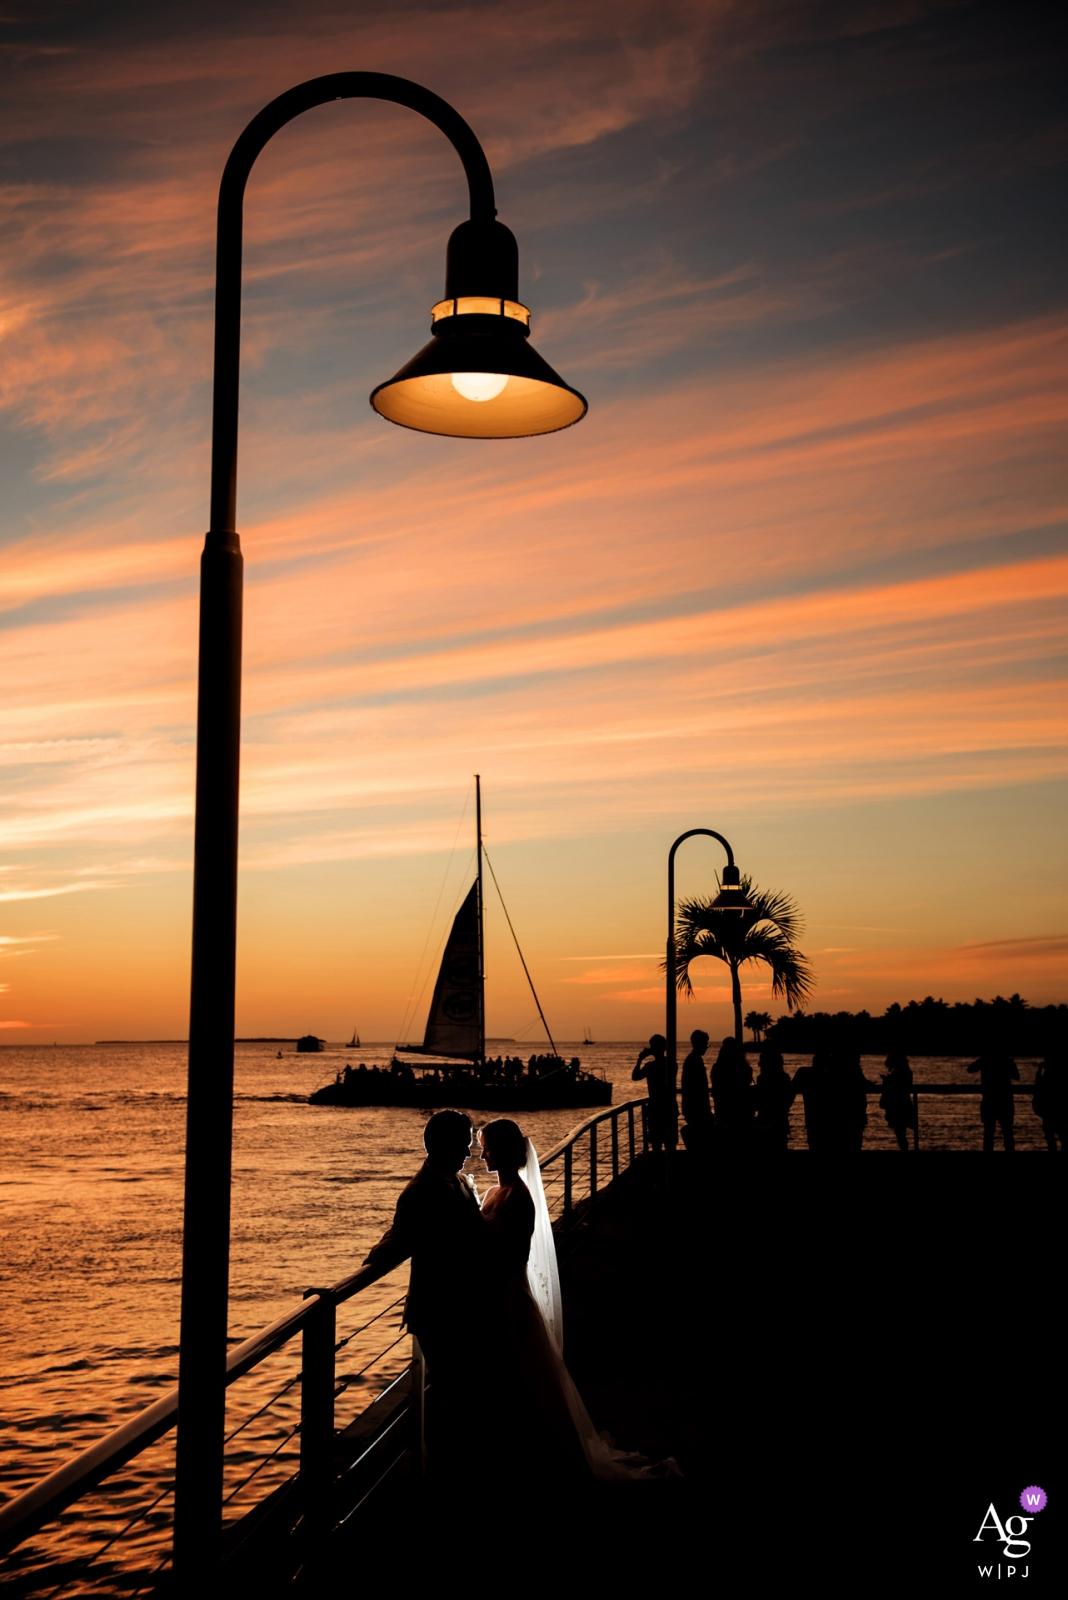 Key West Sunset Sail - Bride and Groom Lit Portrait